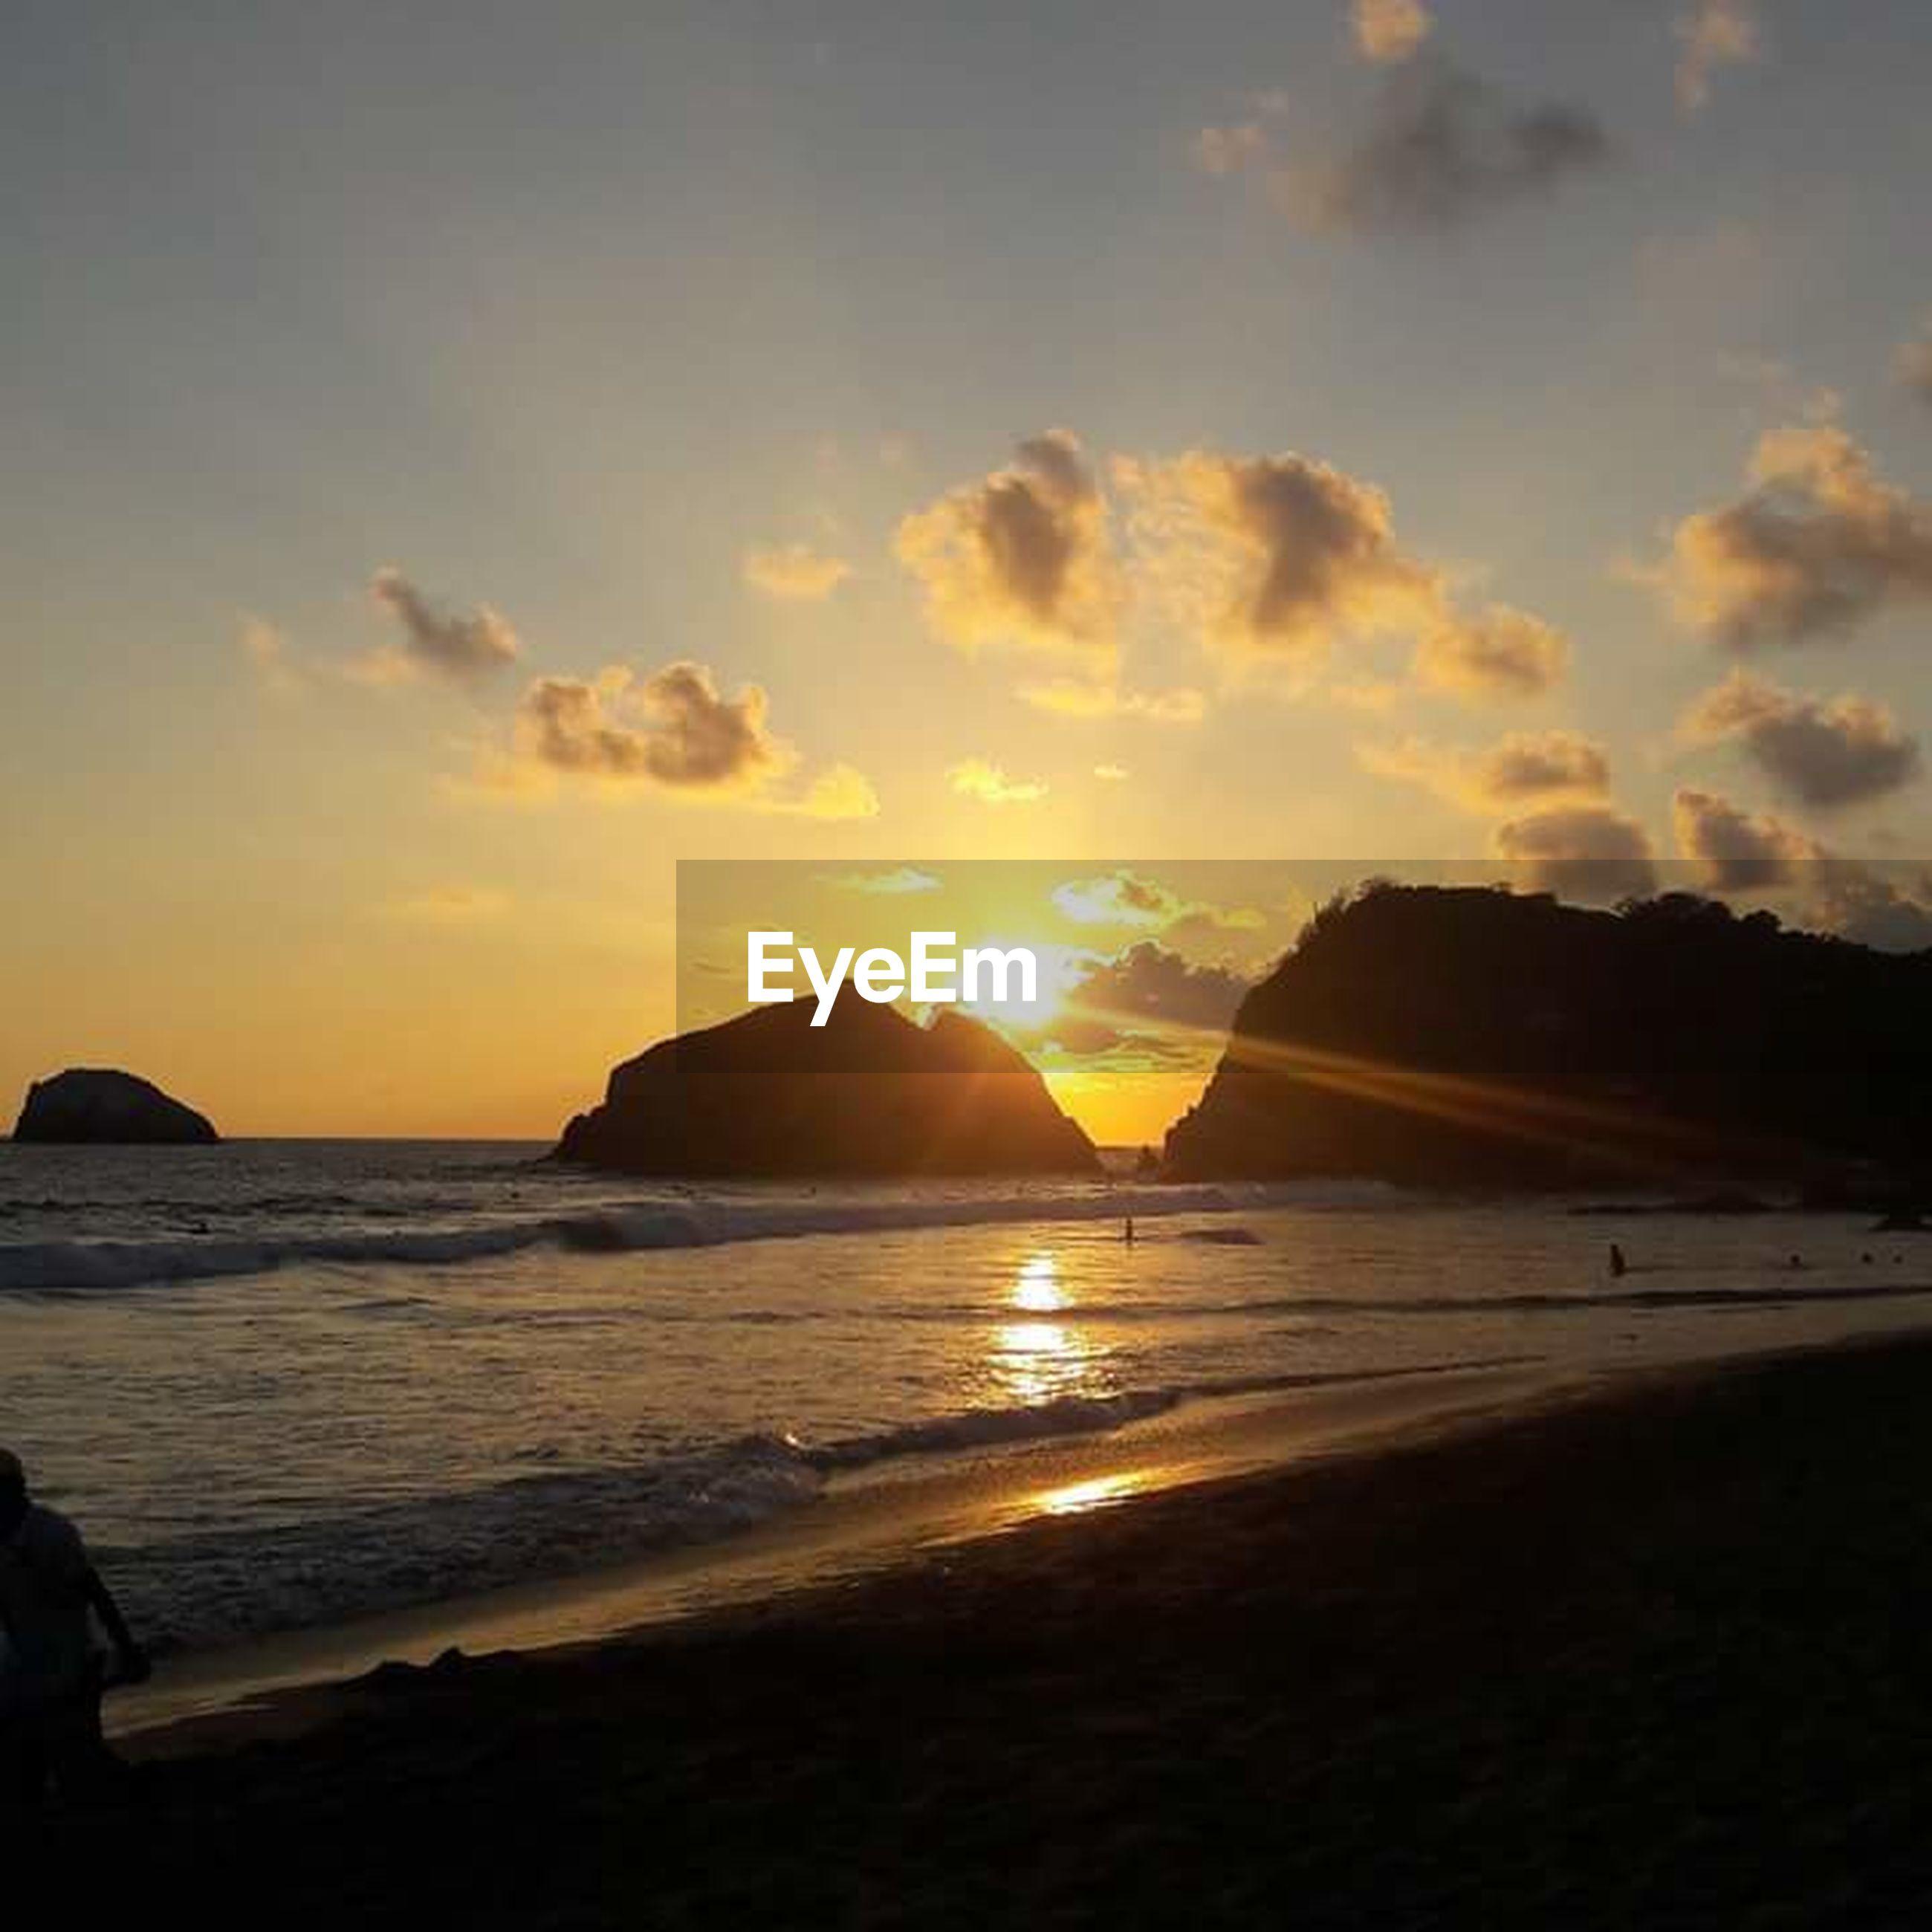 sunset, sea, beach, water, scenics, sun, tranquil scene, beauty in nature, shore, tranquility, sky, silhouette, horizon over water, idyllic, nature, mountain, orange color, sunlight, sand, coastline